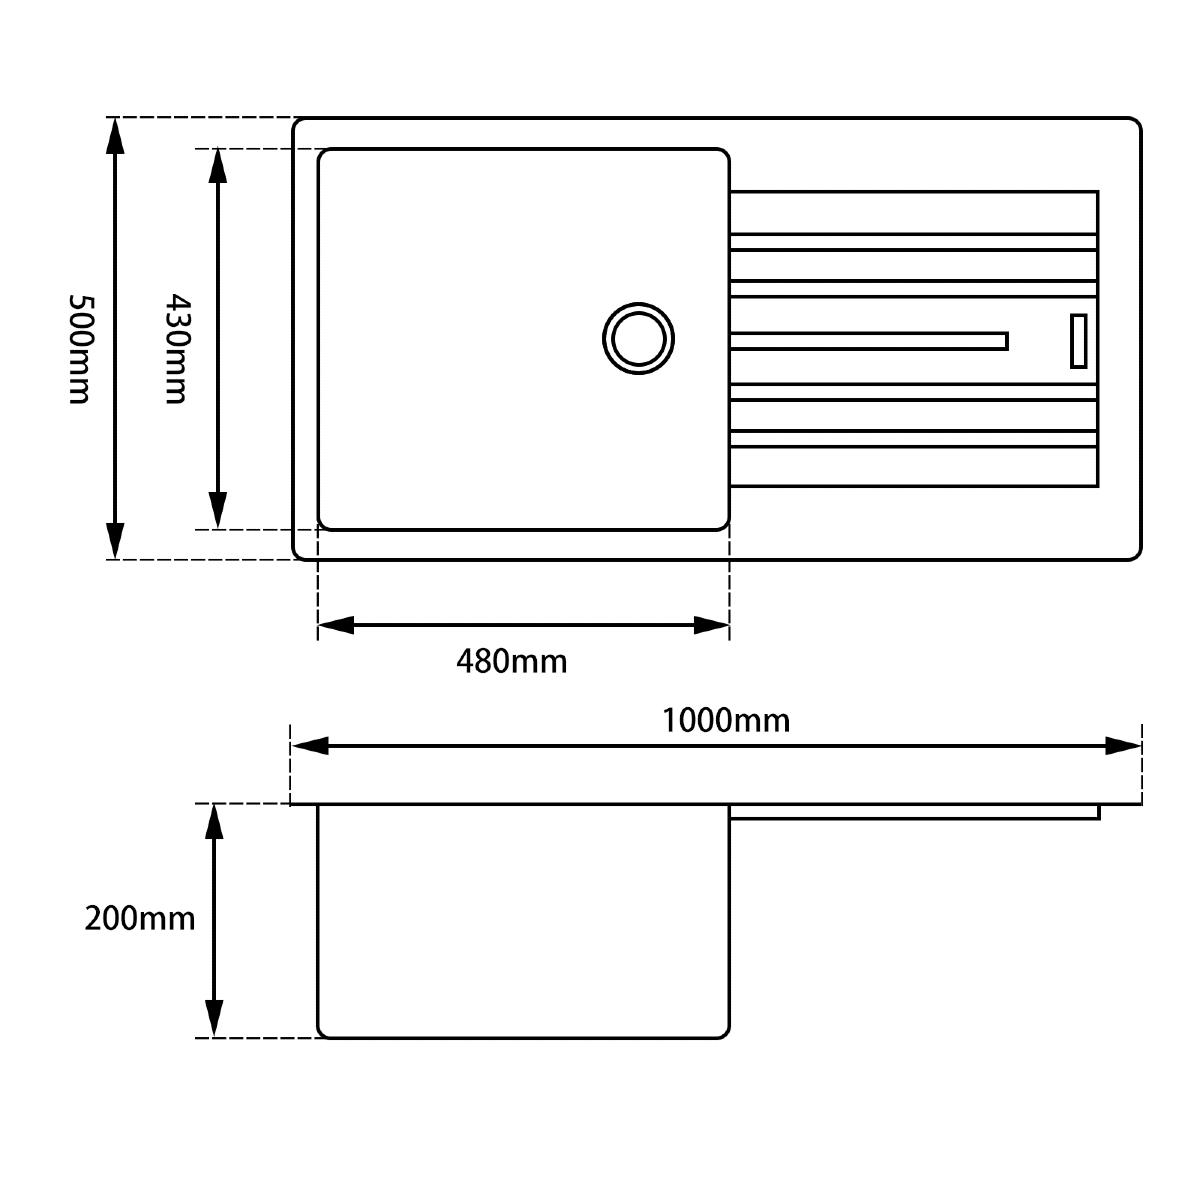 Arete Granite Kitchen Sink Product Specification